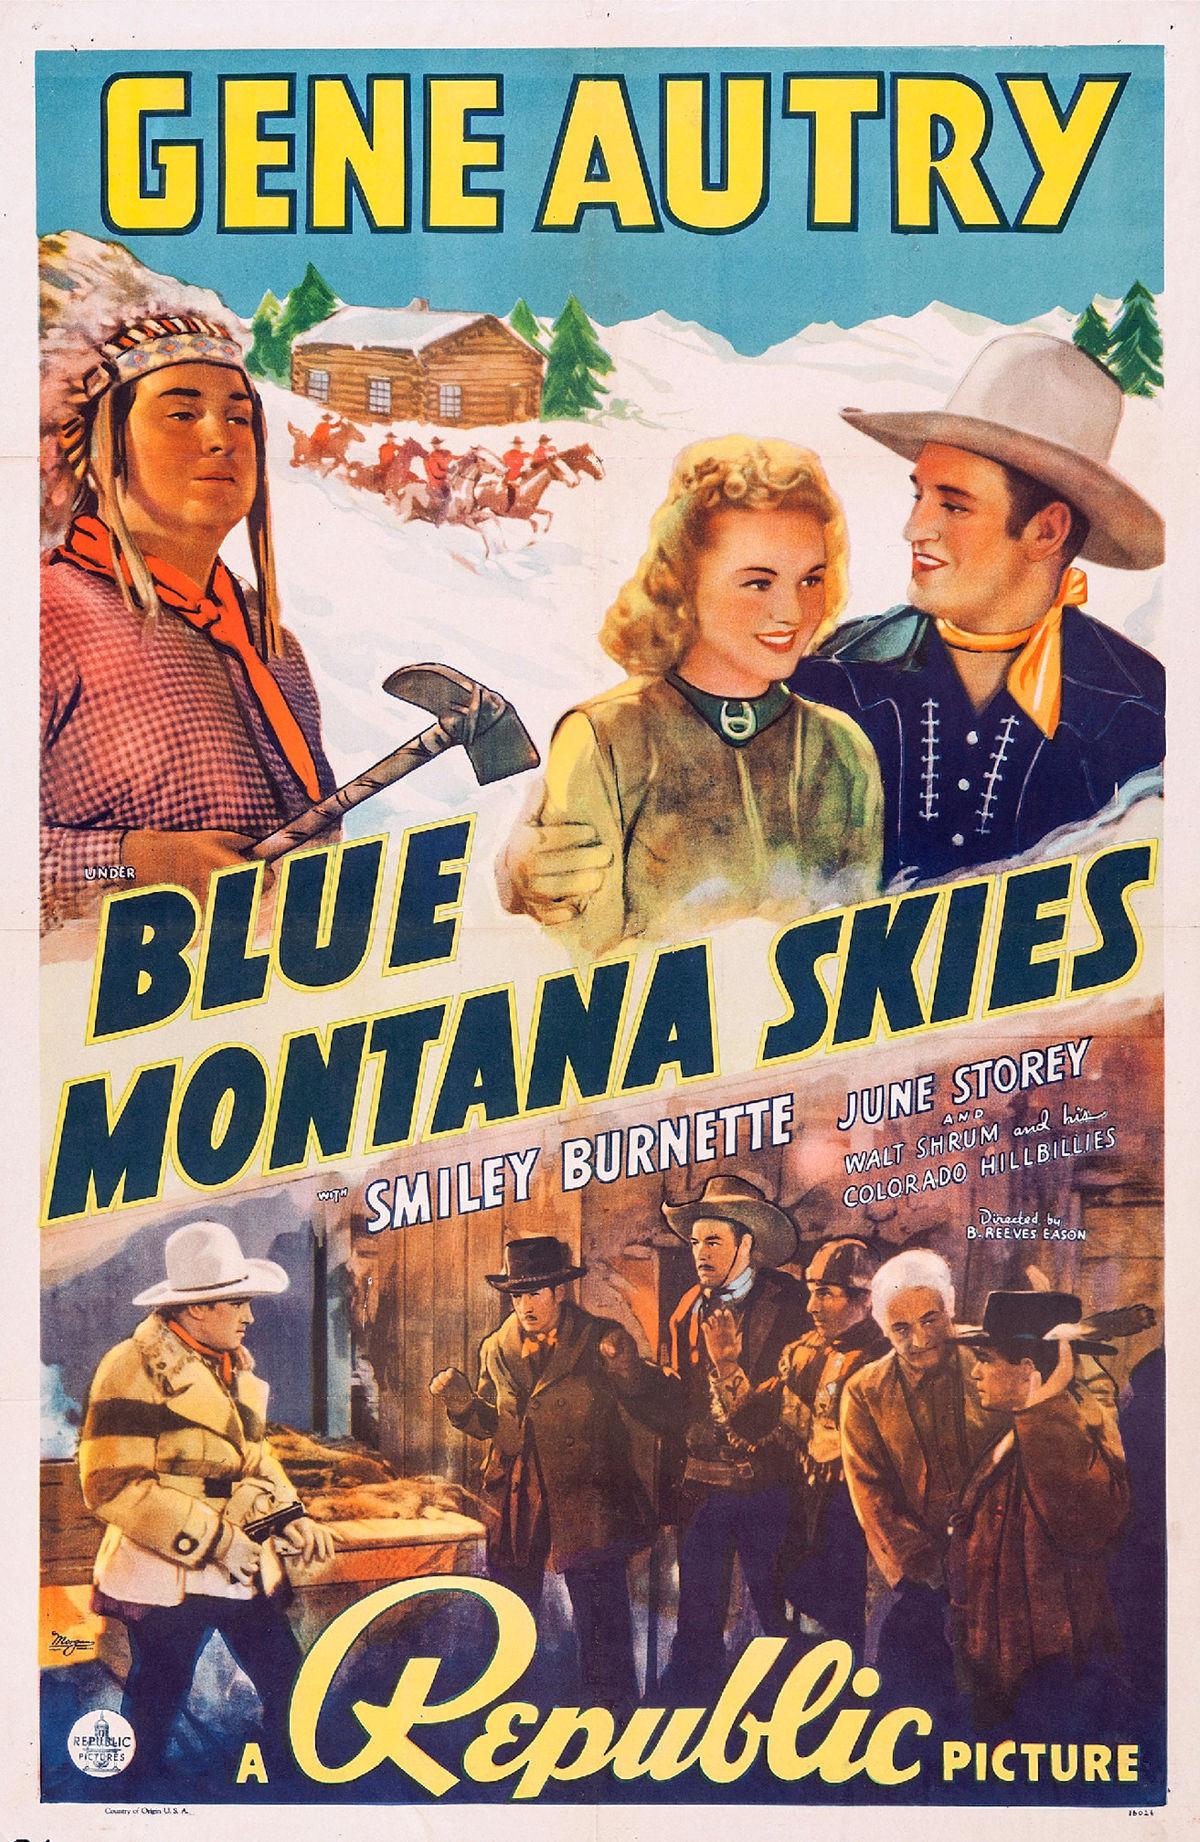 Gene Autry Blue Montana Skies / Rhythm Of The Hood Beats